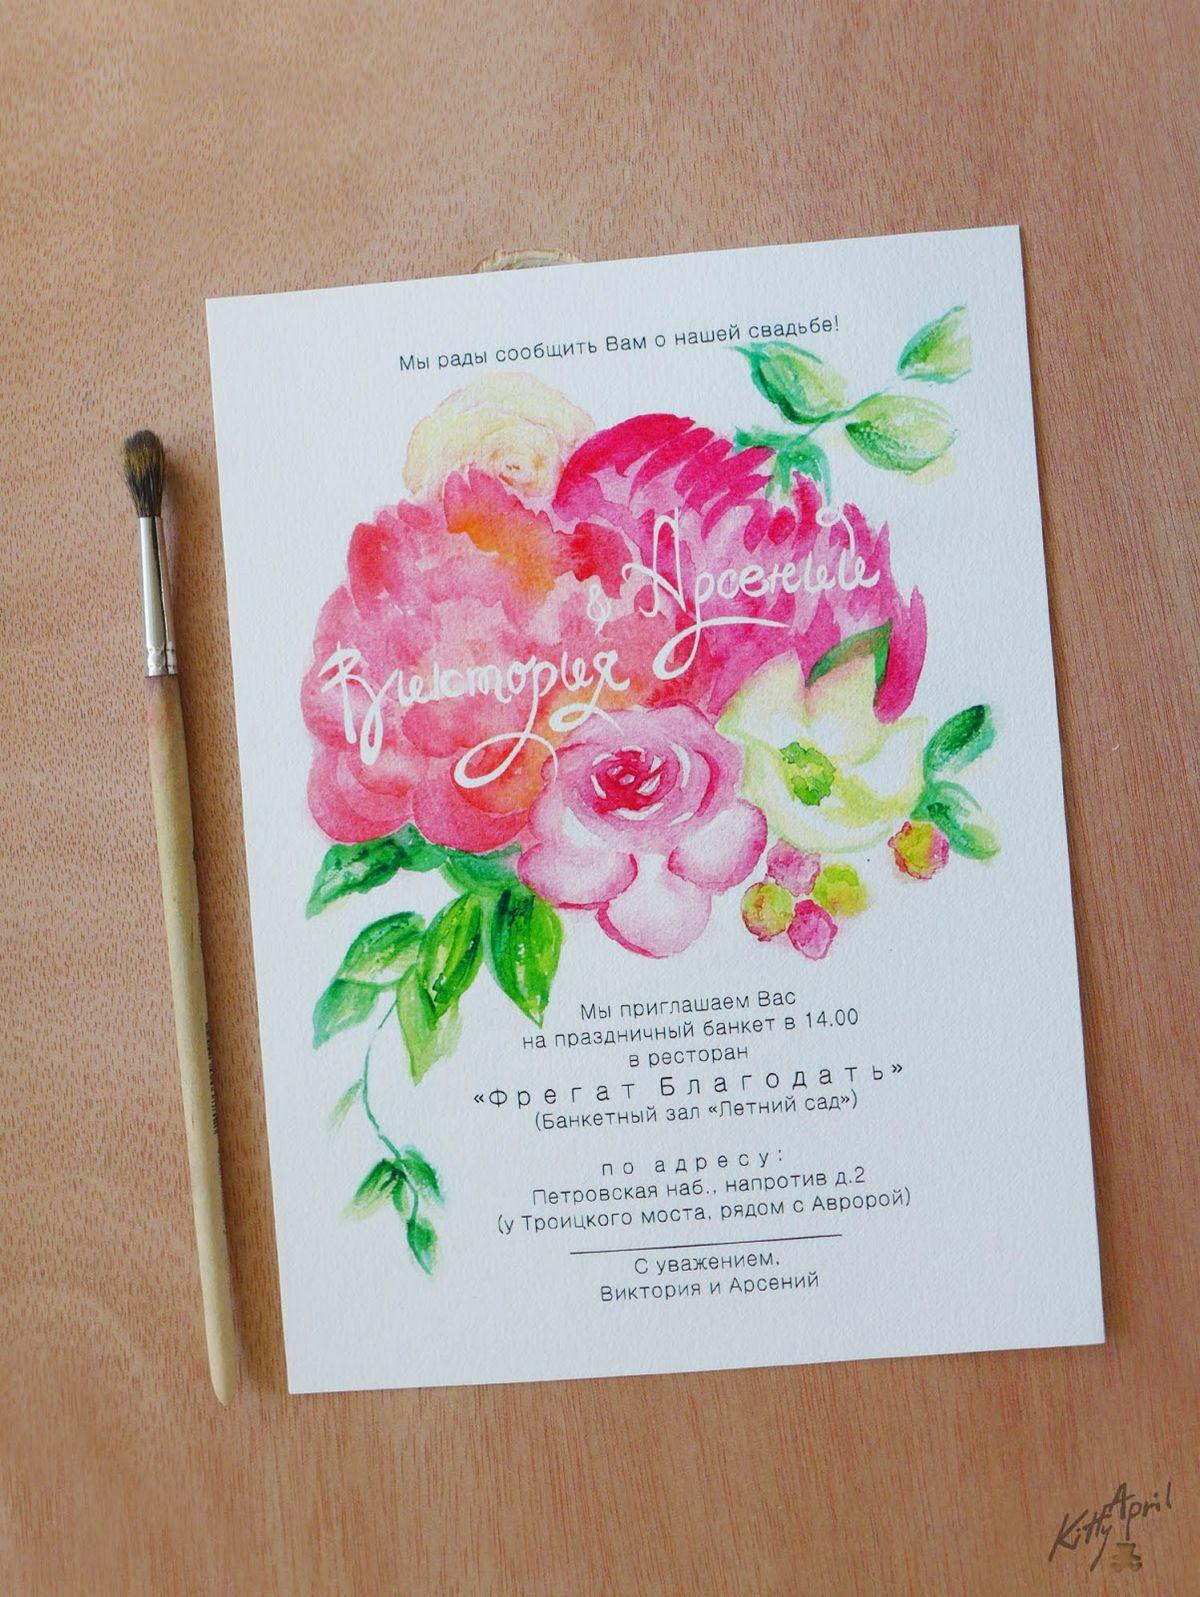 invitation-to-the wedding